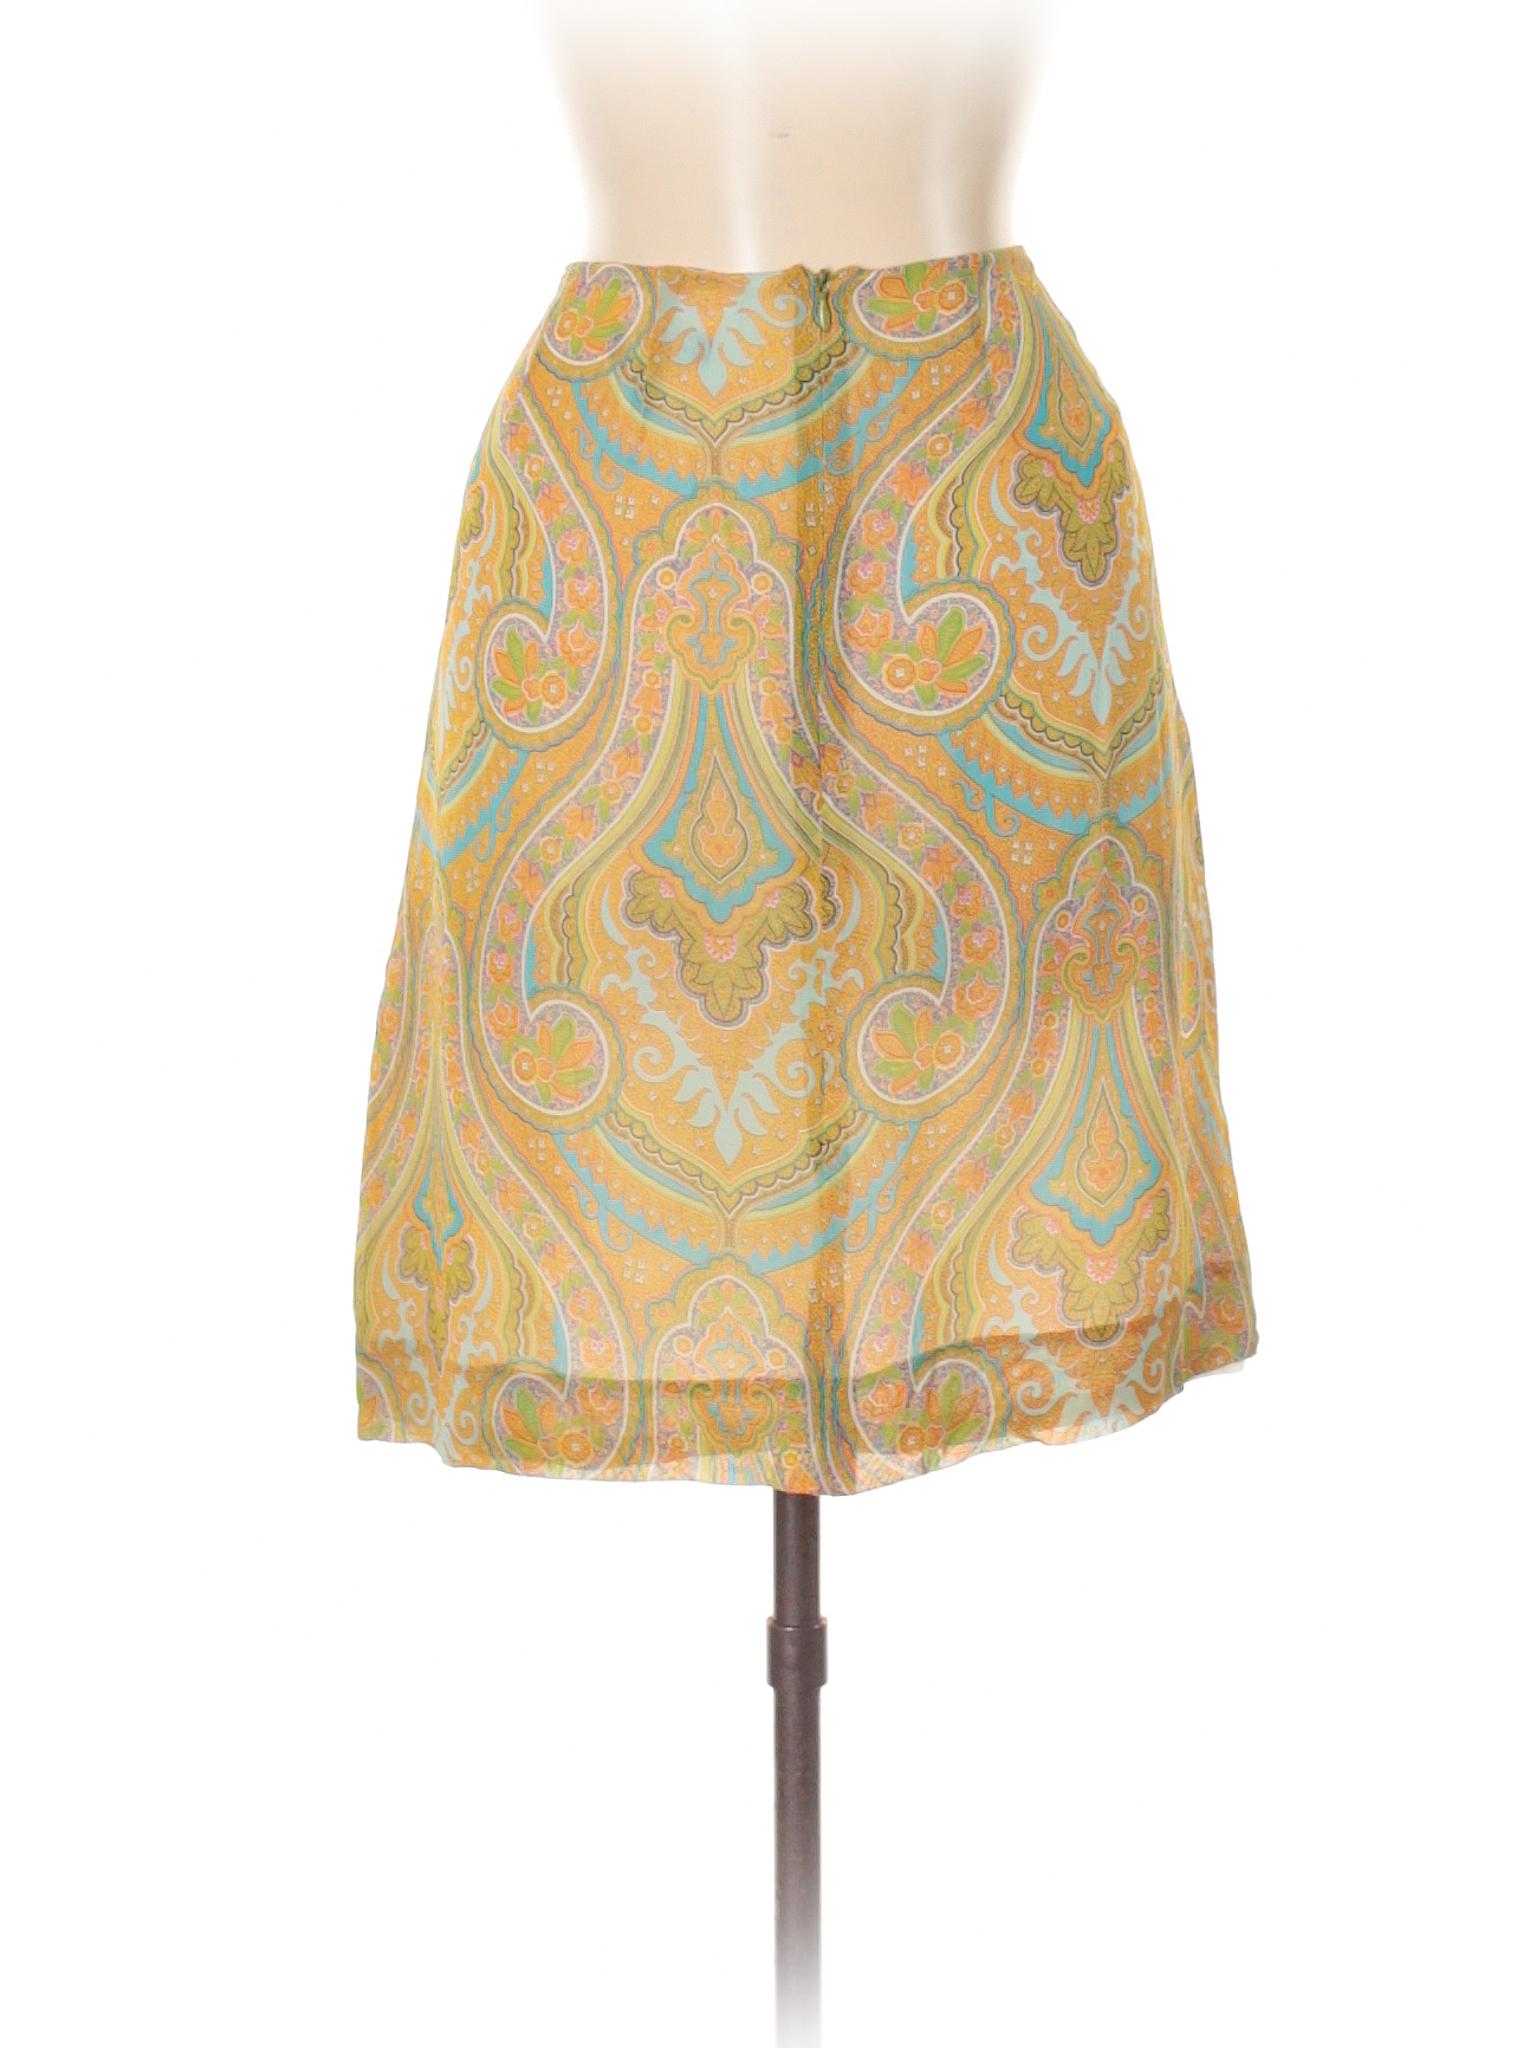 Burberry Boutique Boutique Burberry Silk Silk Skirt nqPYzxawH